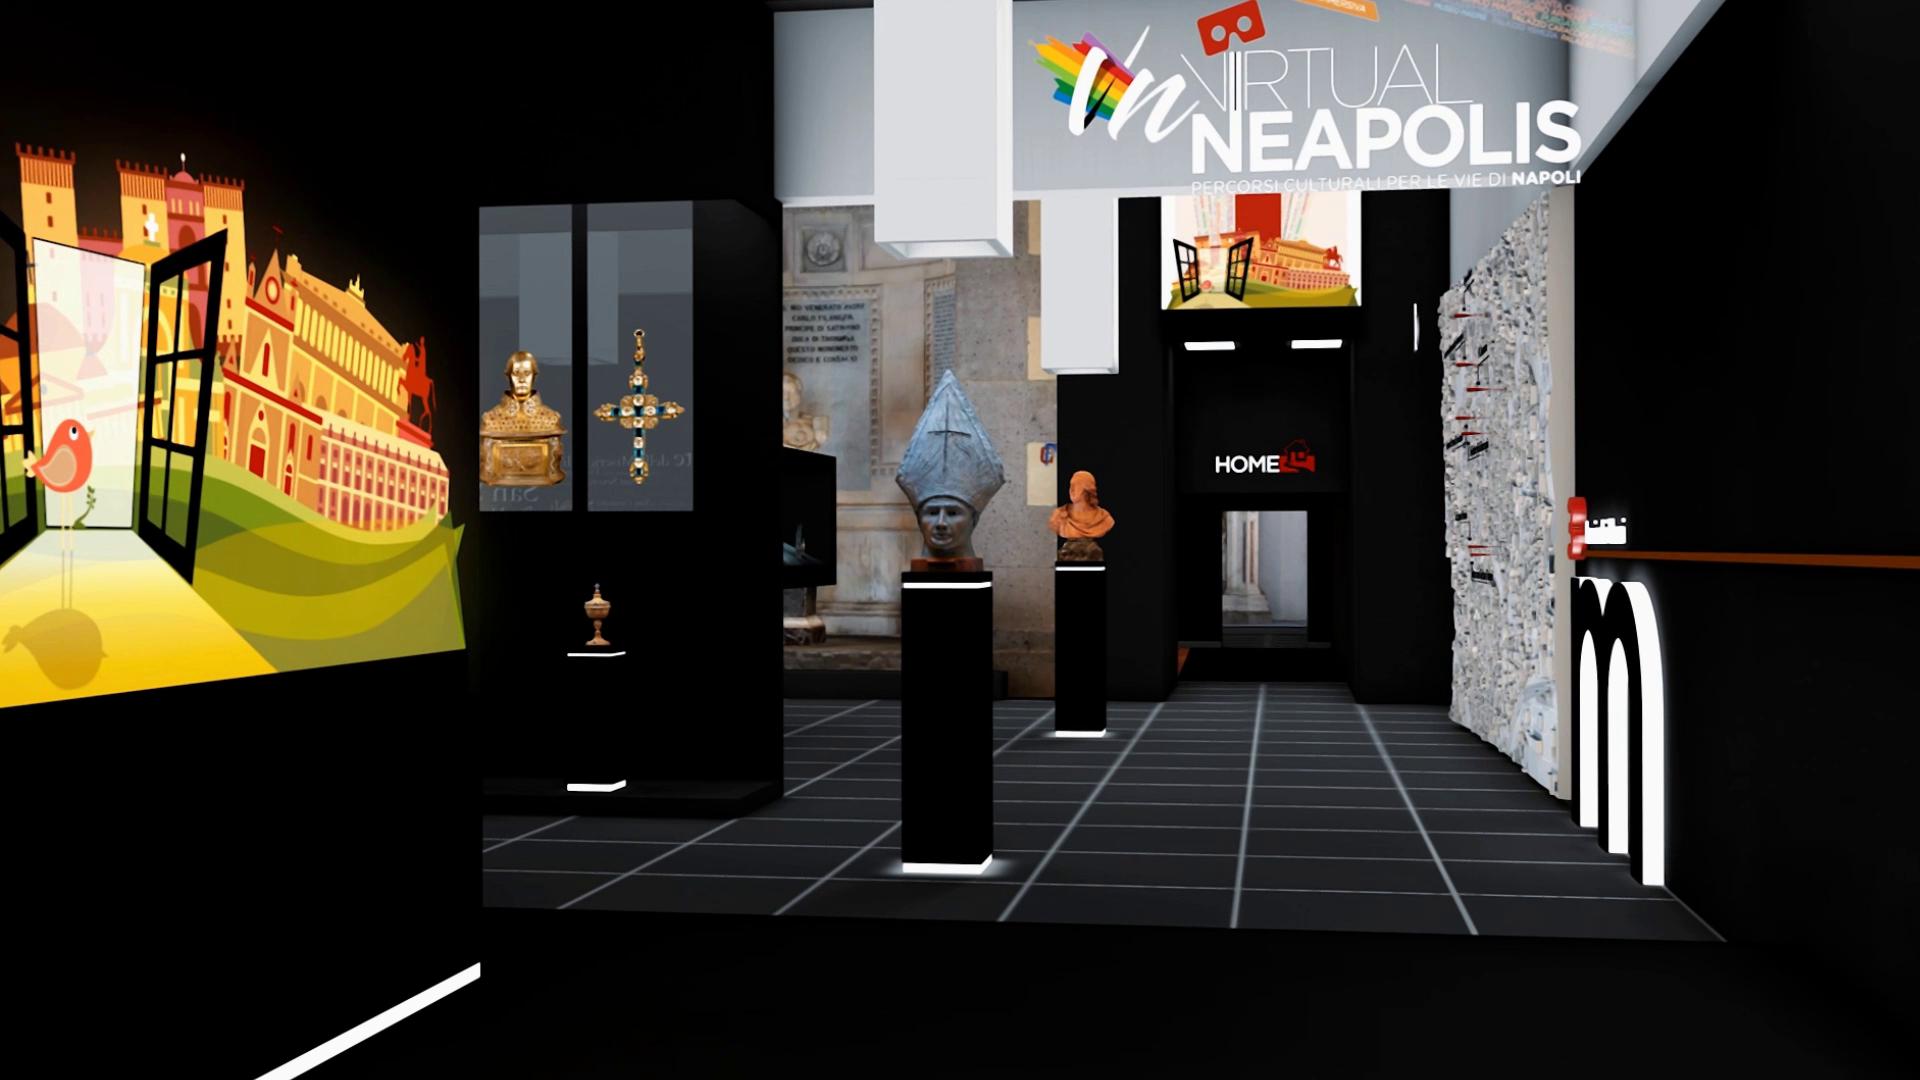 virtual neapolis2